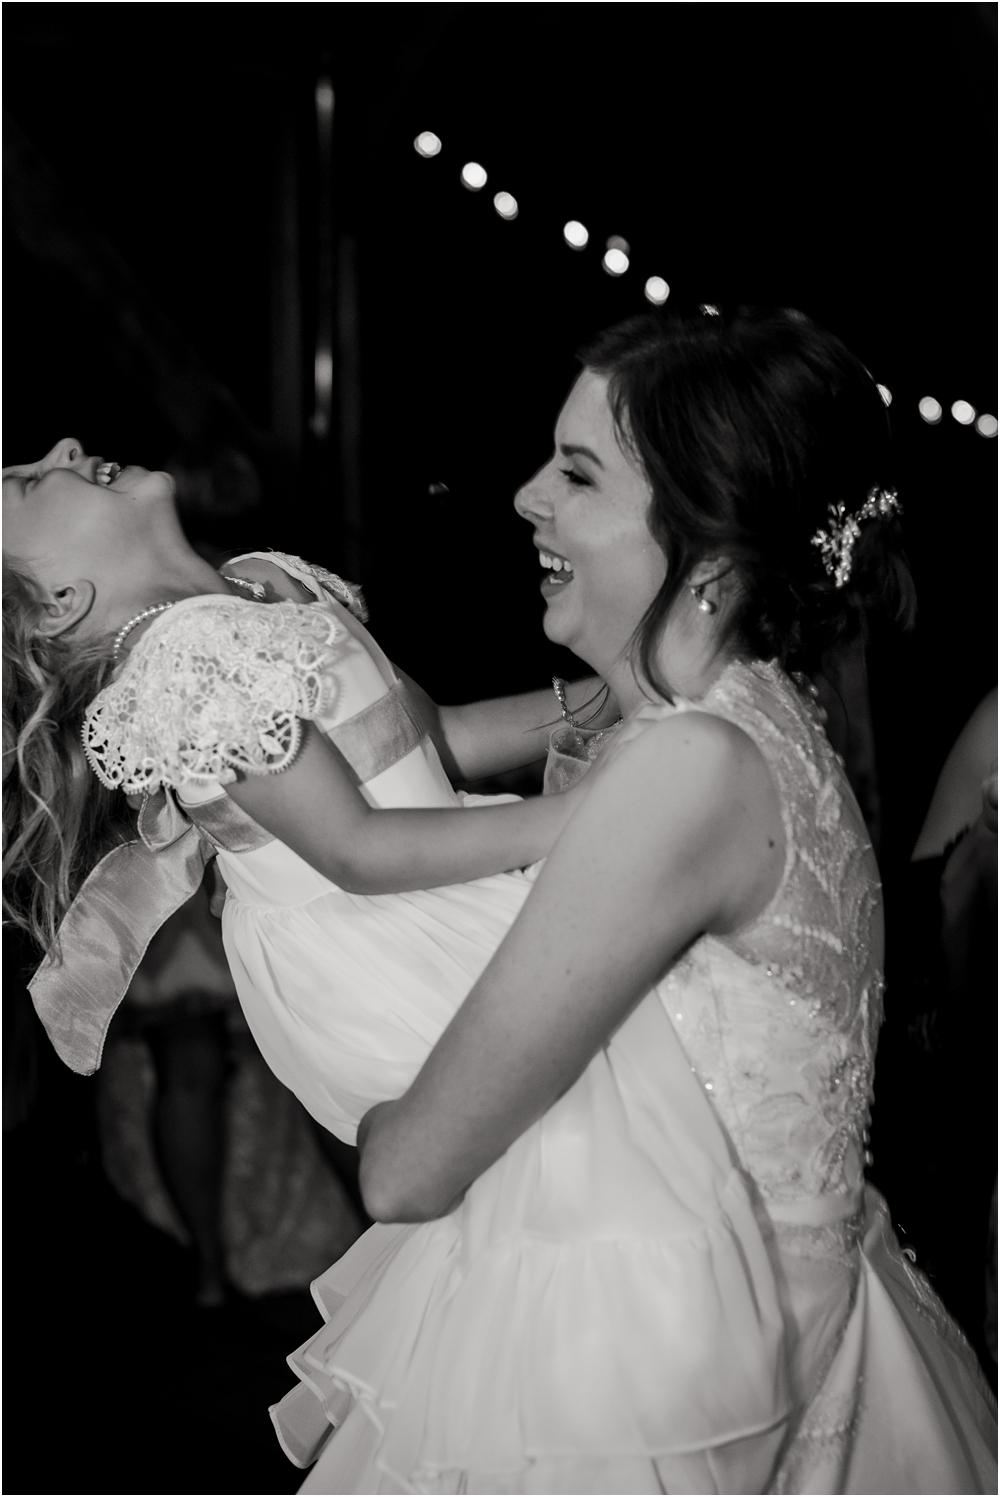 marianna-florida-wedding-photographer-kiersten-grant-209.jpg